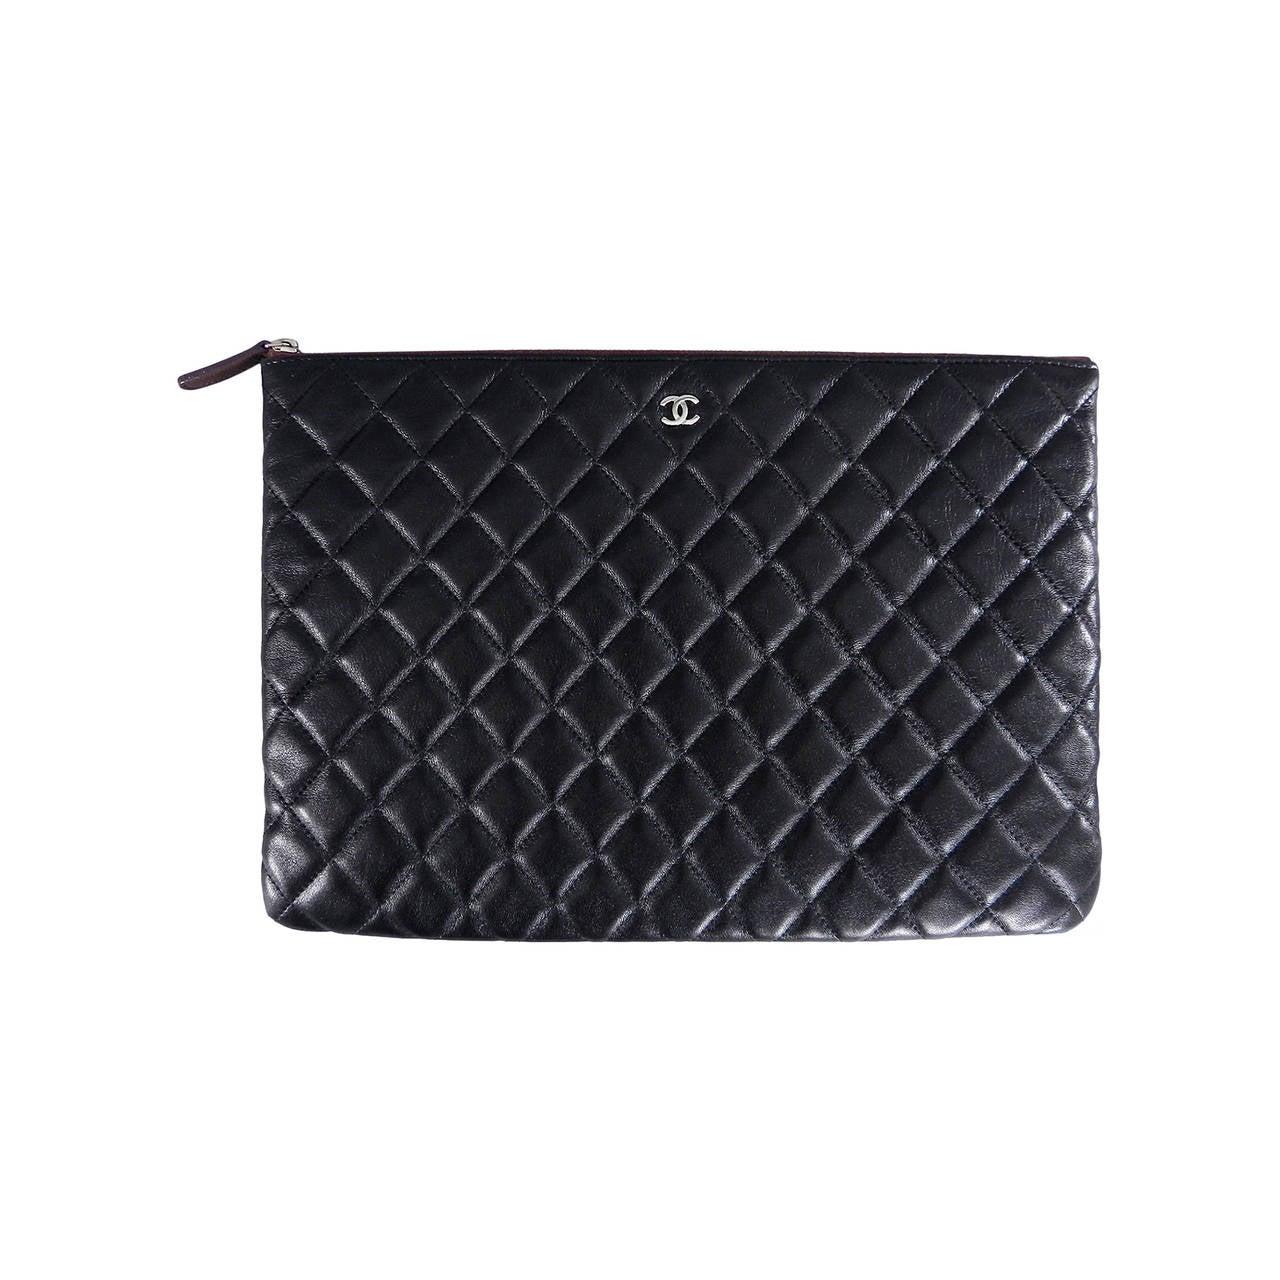 Chanel Large Black Lambskin O Case / clutch / Bag at 1stdibs